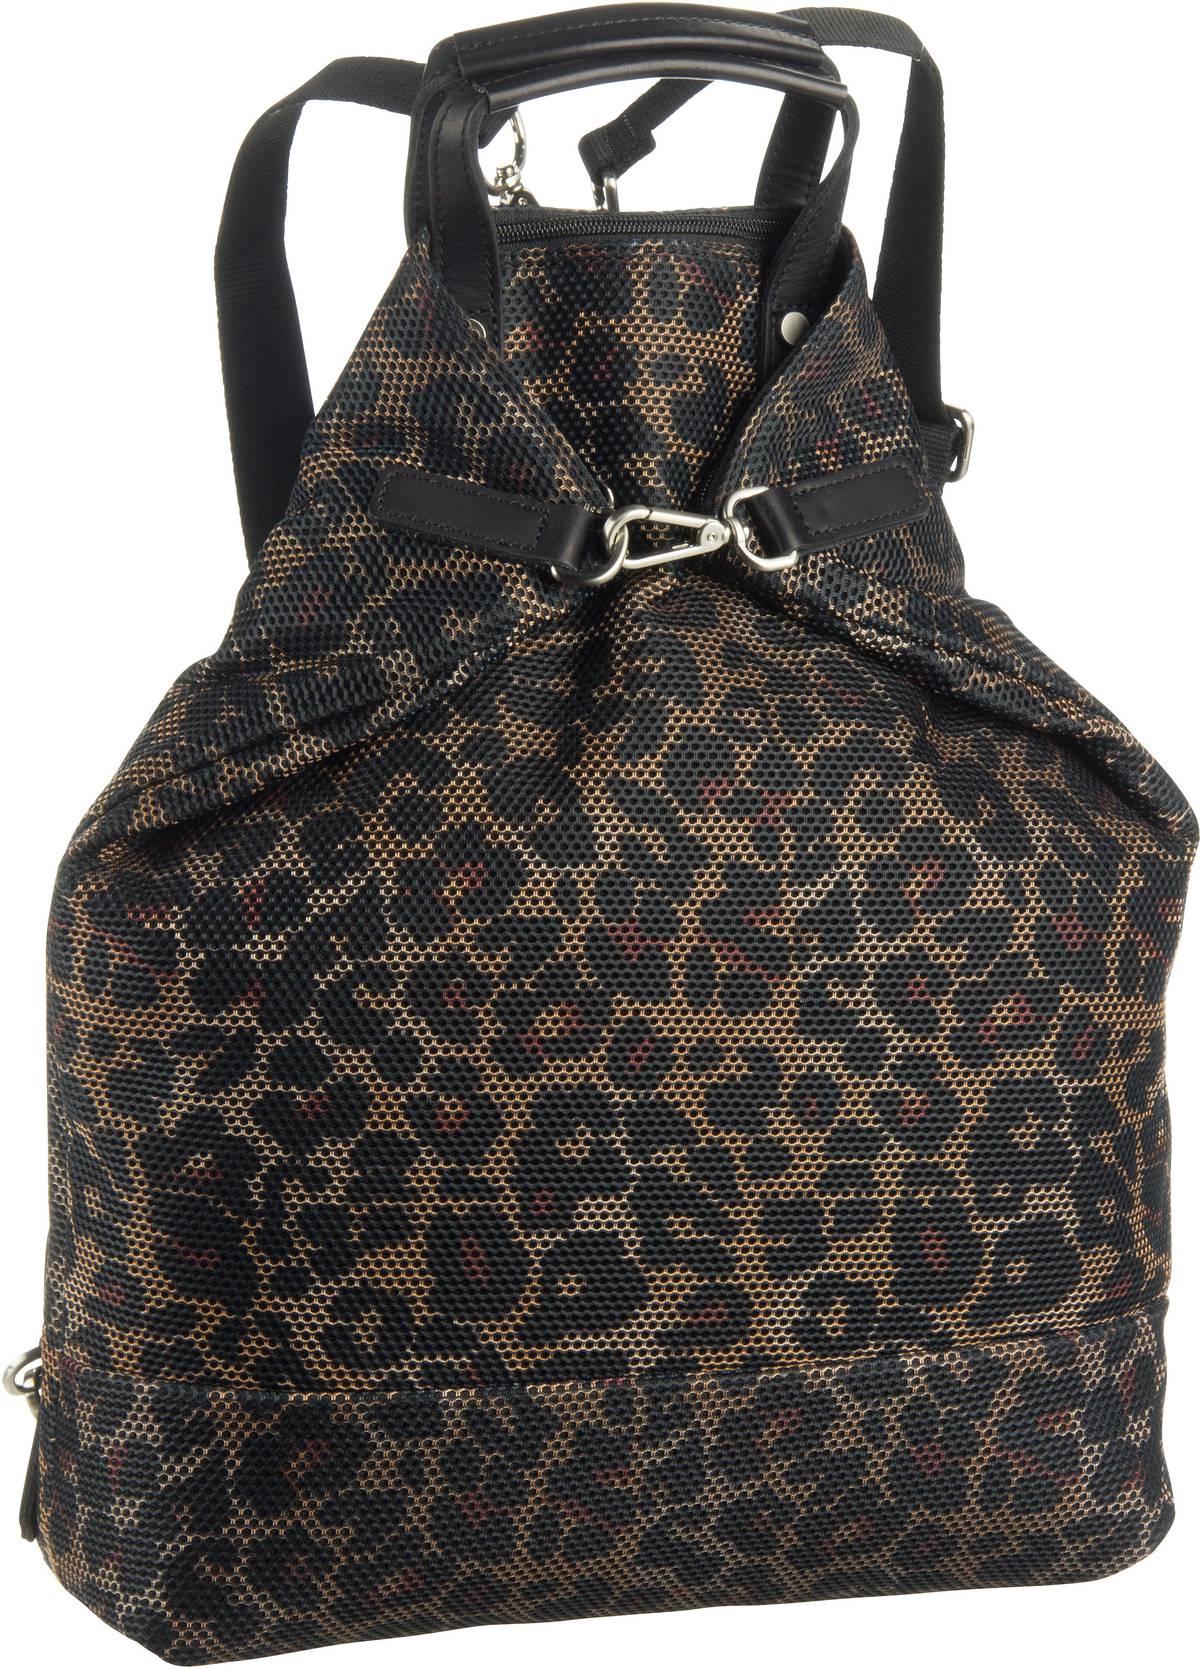 Rucksack / Daypack Mesh 6170 X-Change 3in1 Bag M Leo